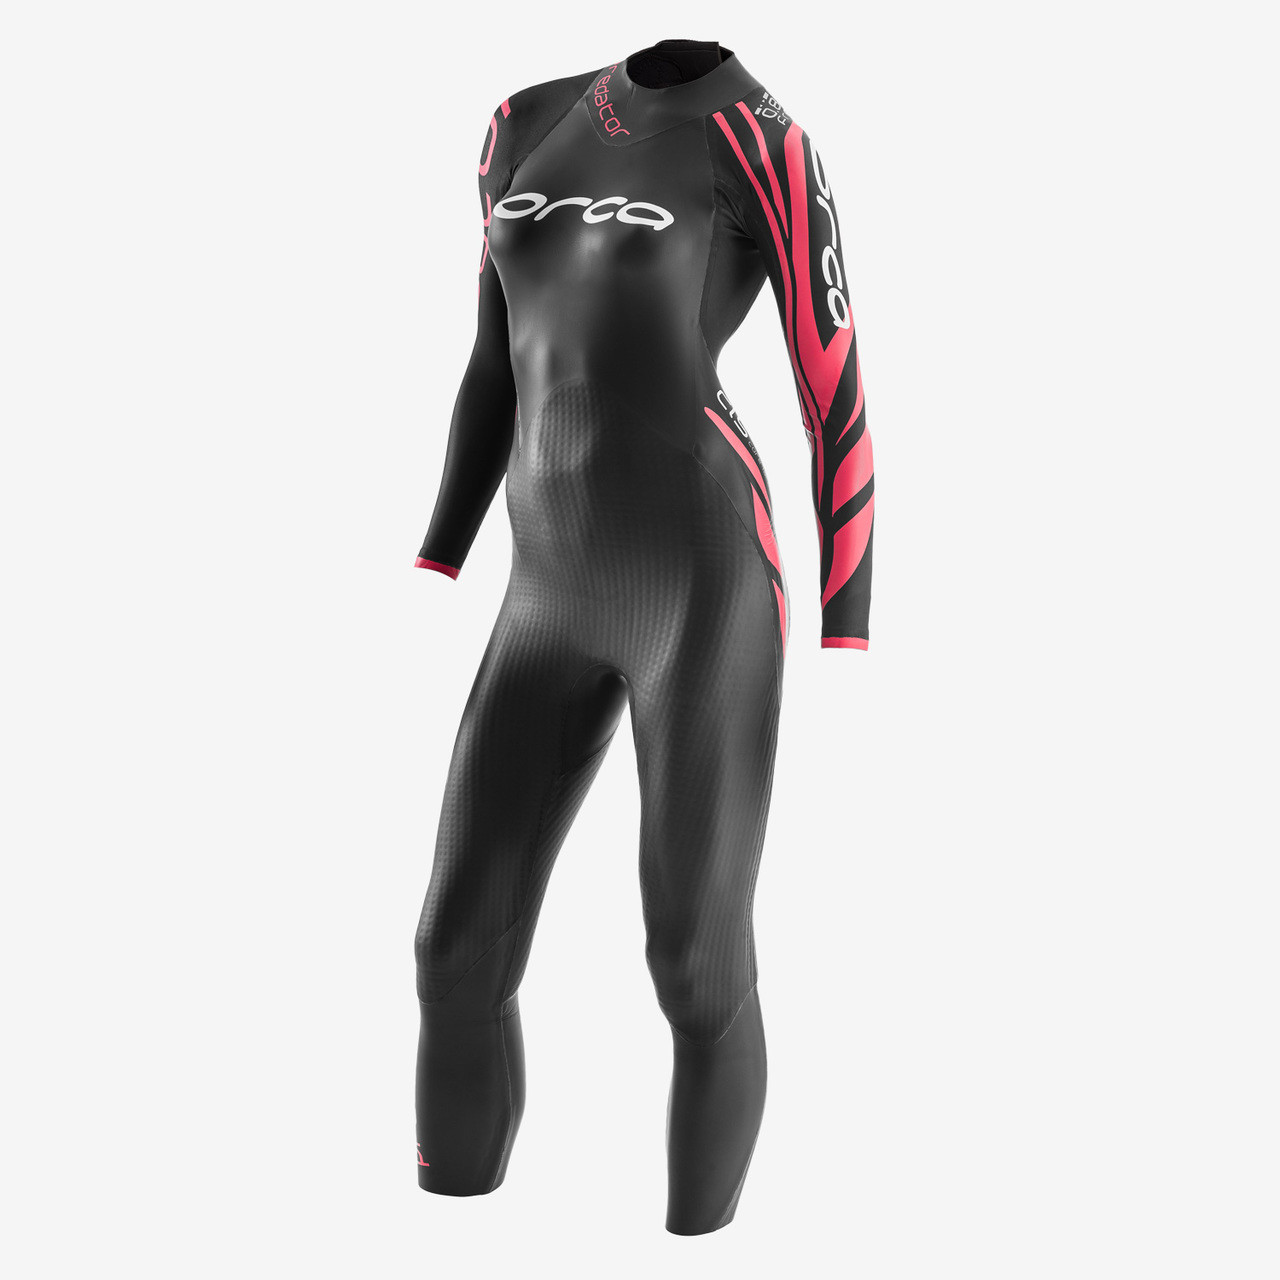 Orca Women's Predator Wetsuit - 2018 price